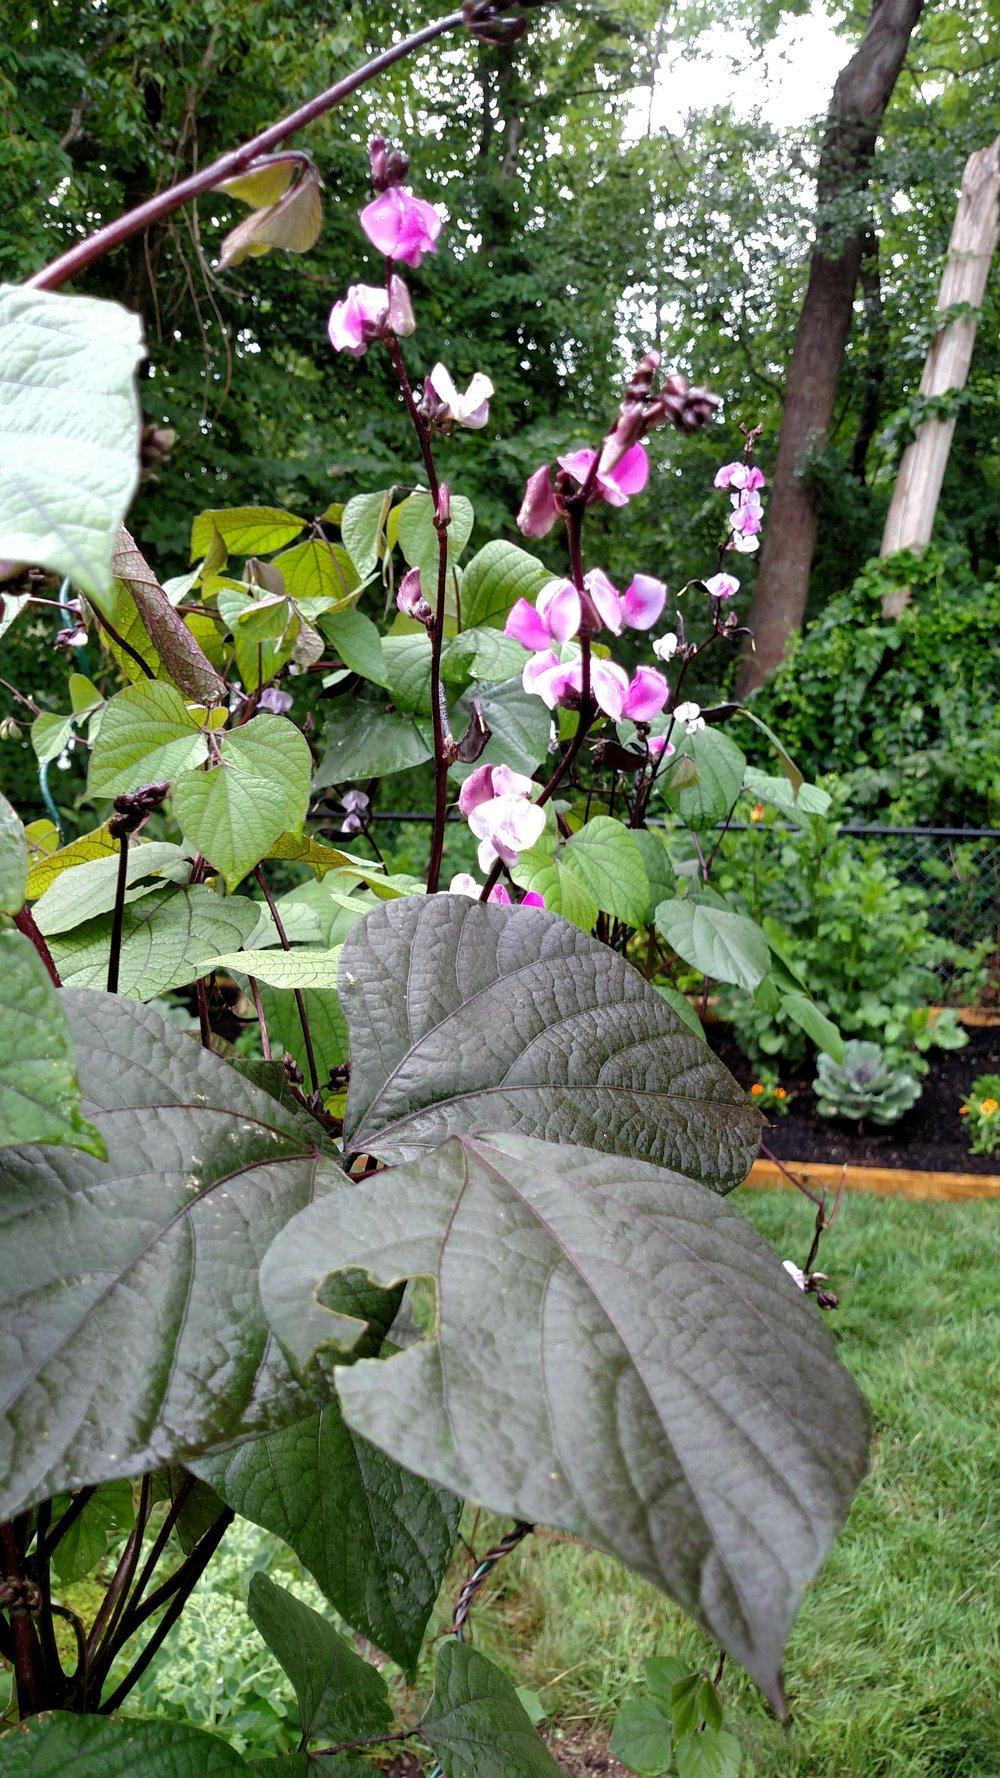 7-20-18 Shapiro Garden 9.jpg